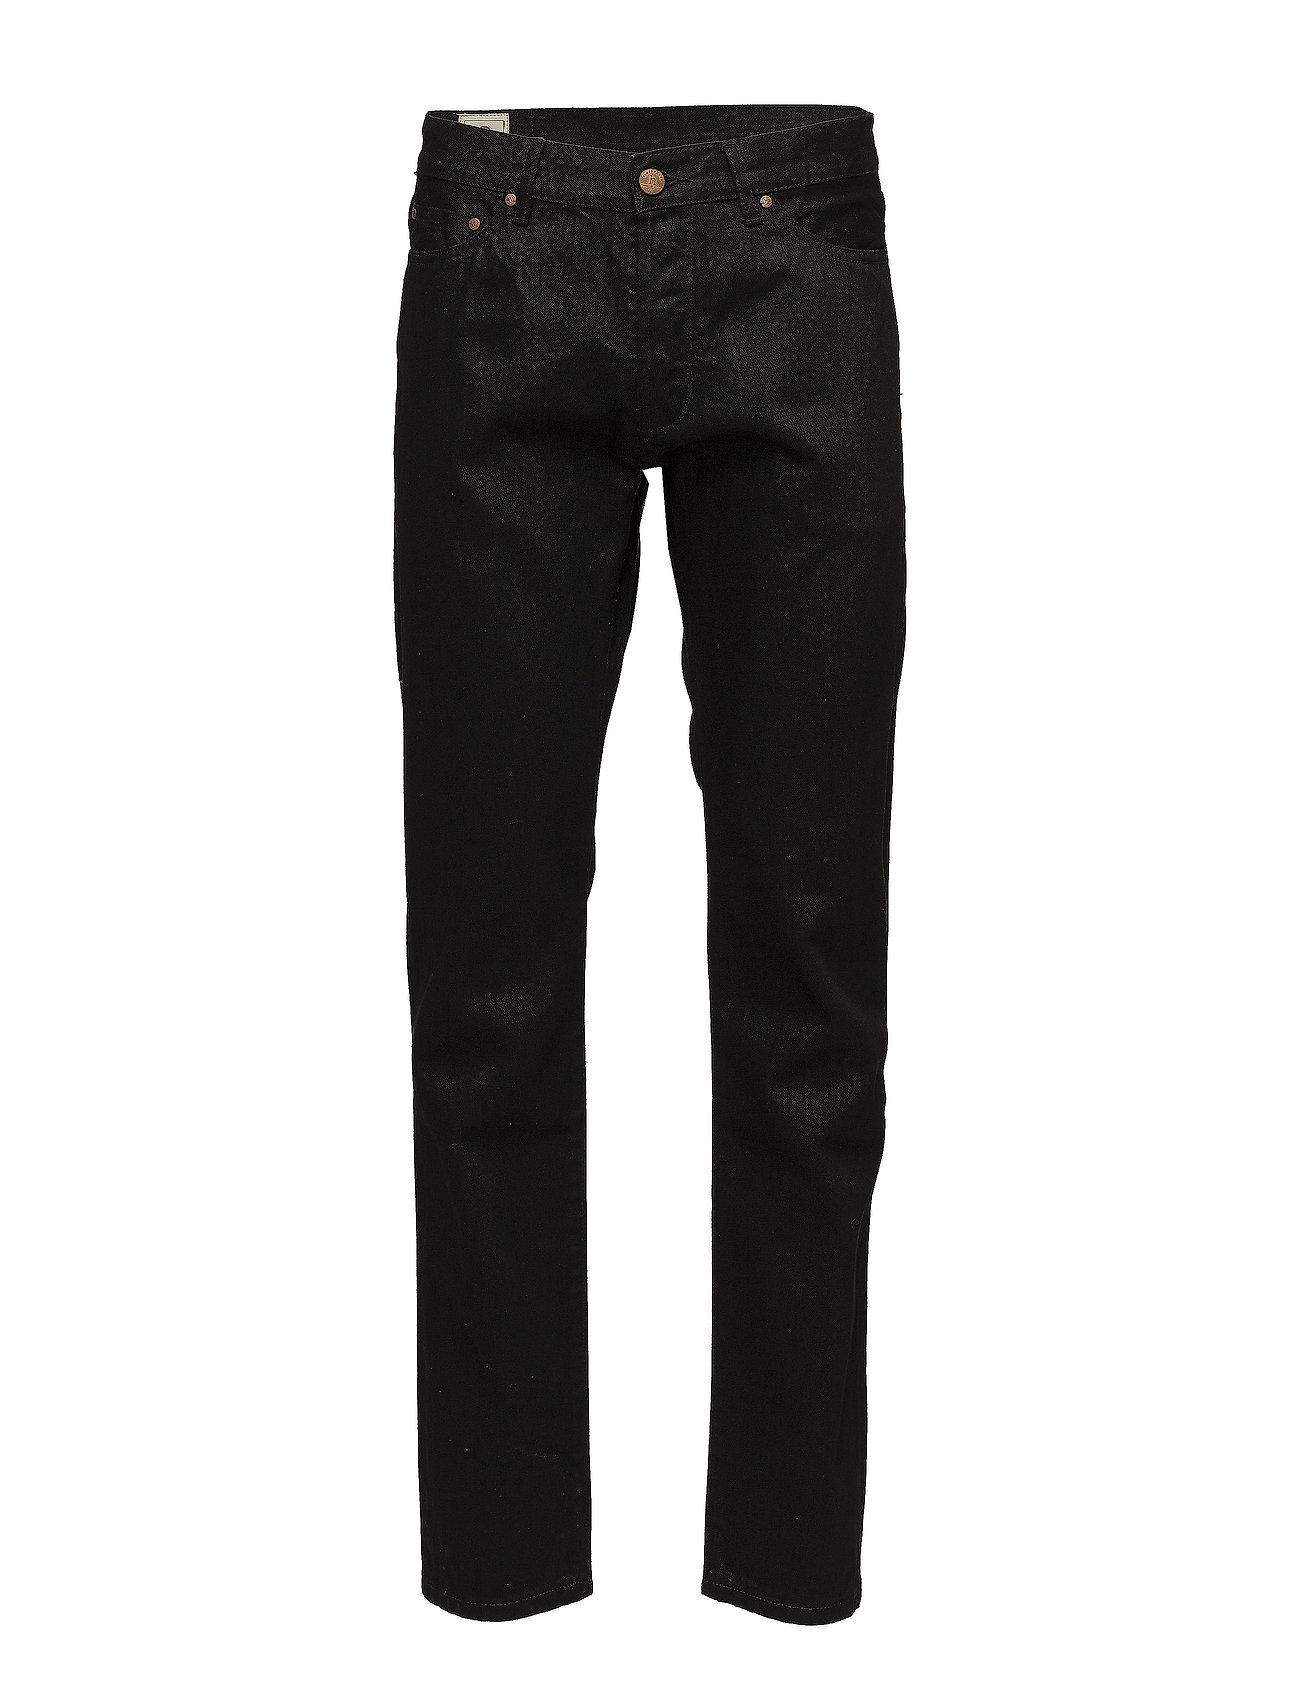 HAN Kjøbenhavn Tapered Jeans - BLACK BLACK